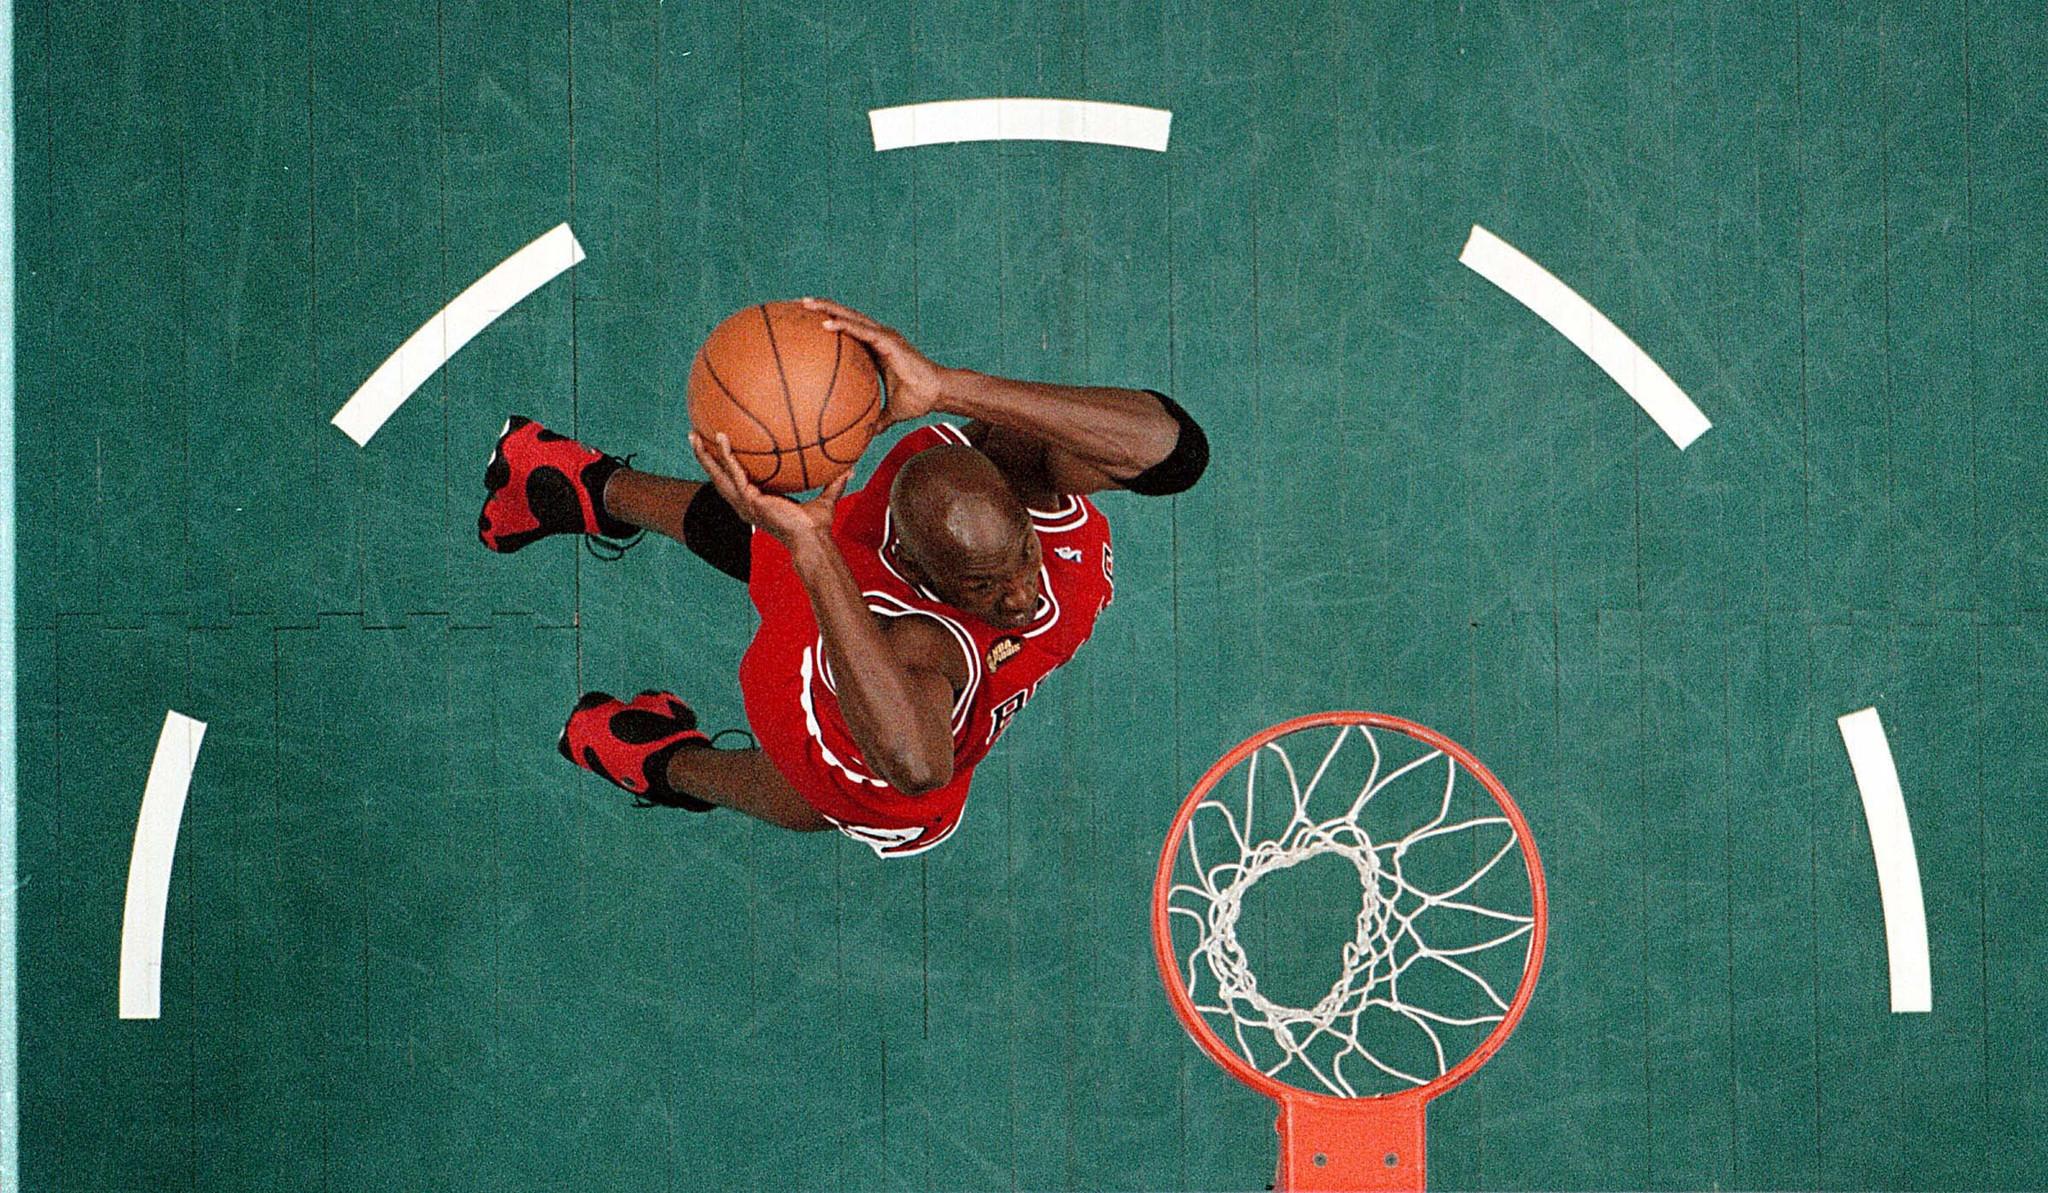 Column: Michael Jordan not a role model